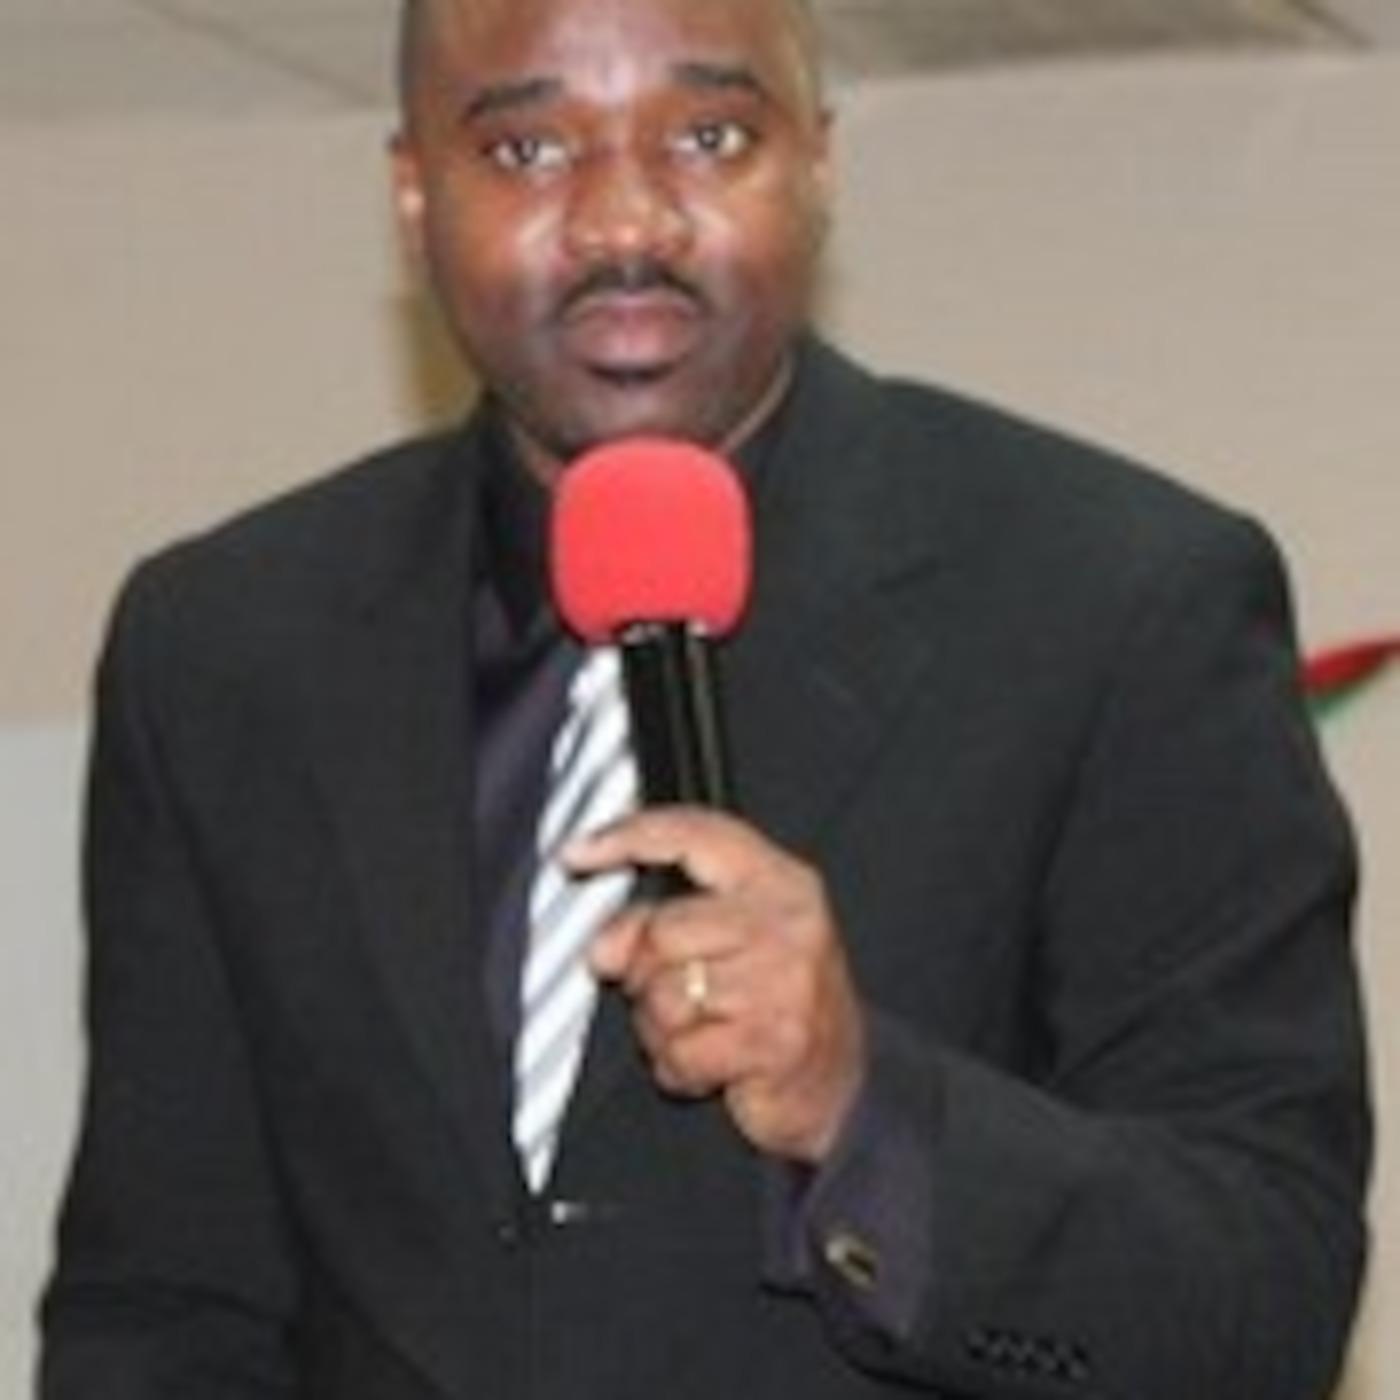 LCI Louisville Podcast - Rev Harold Bedu-Addo